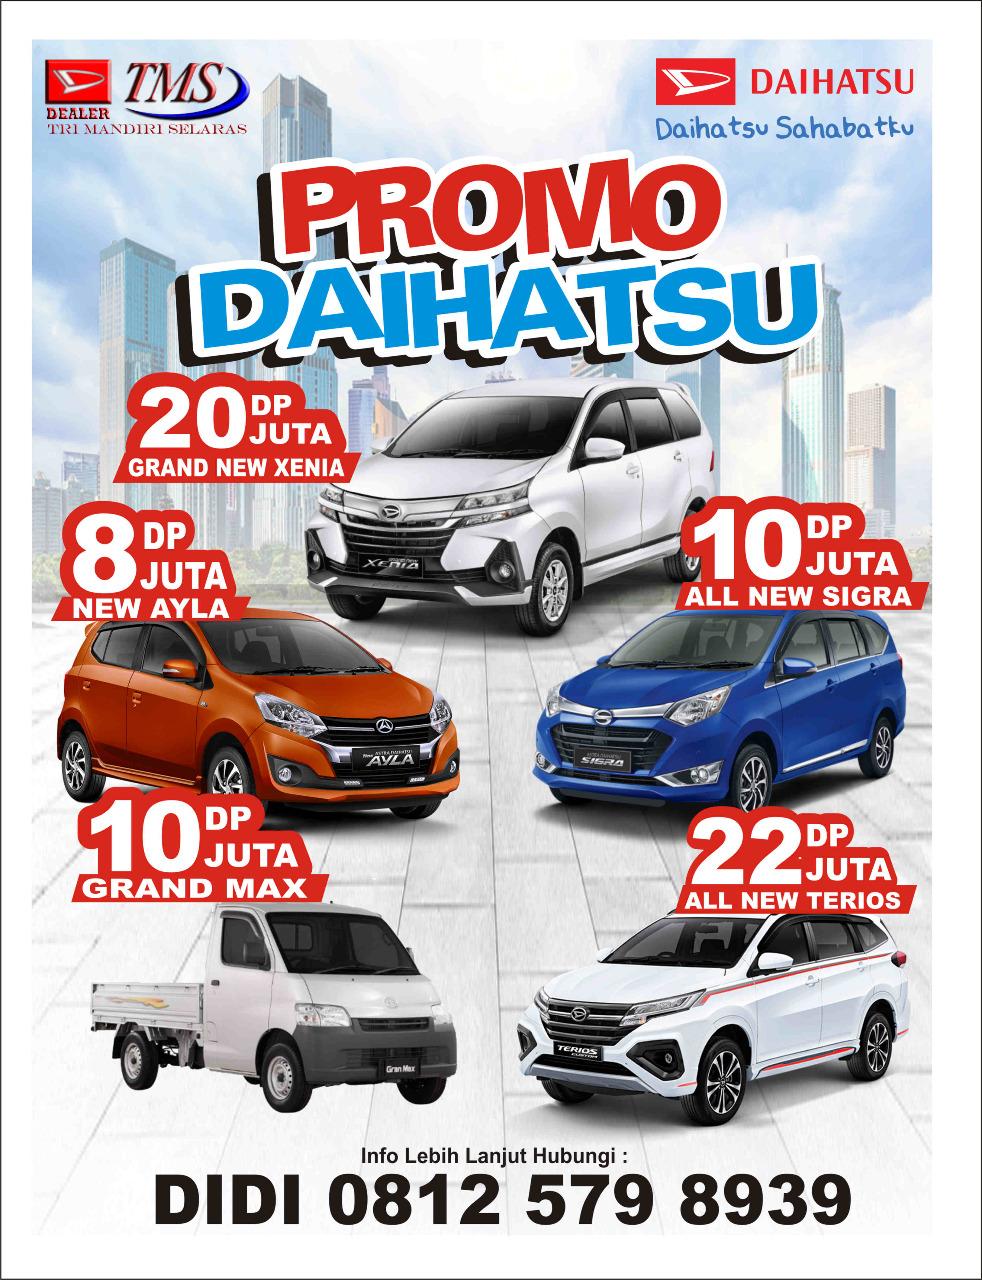 Promo Daihatsu By Didi